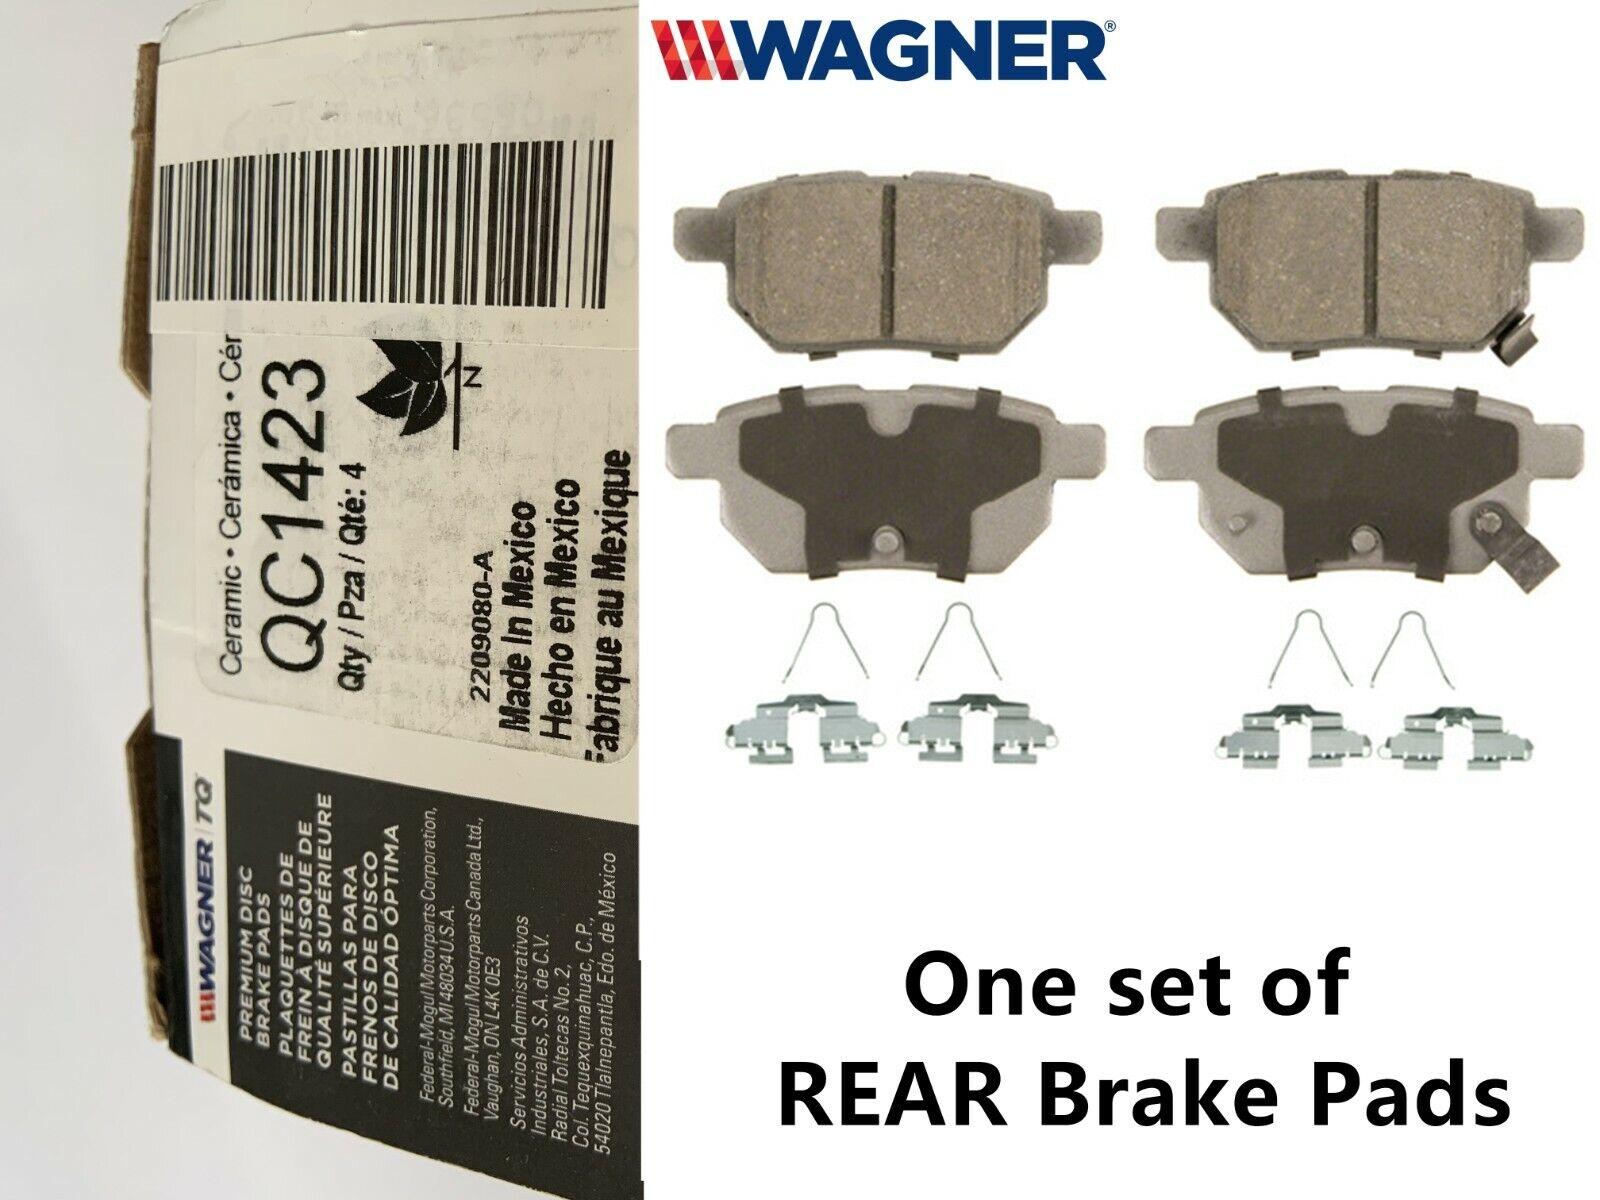 Wagner REAR Ceramic Disc Brake Pad for 2009 2010 Pontiac Vibe, Set of 4, QC1423